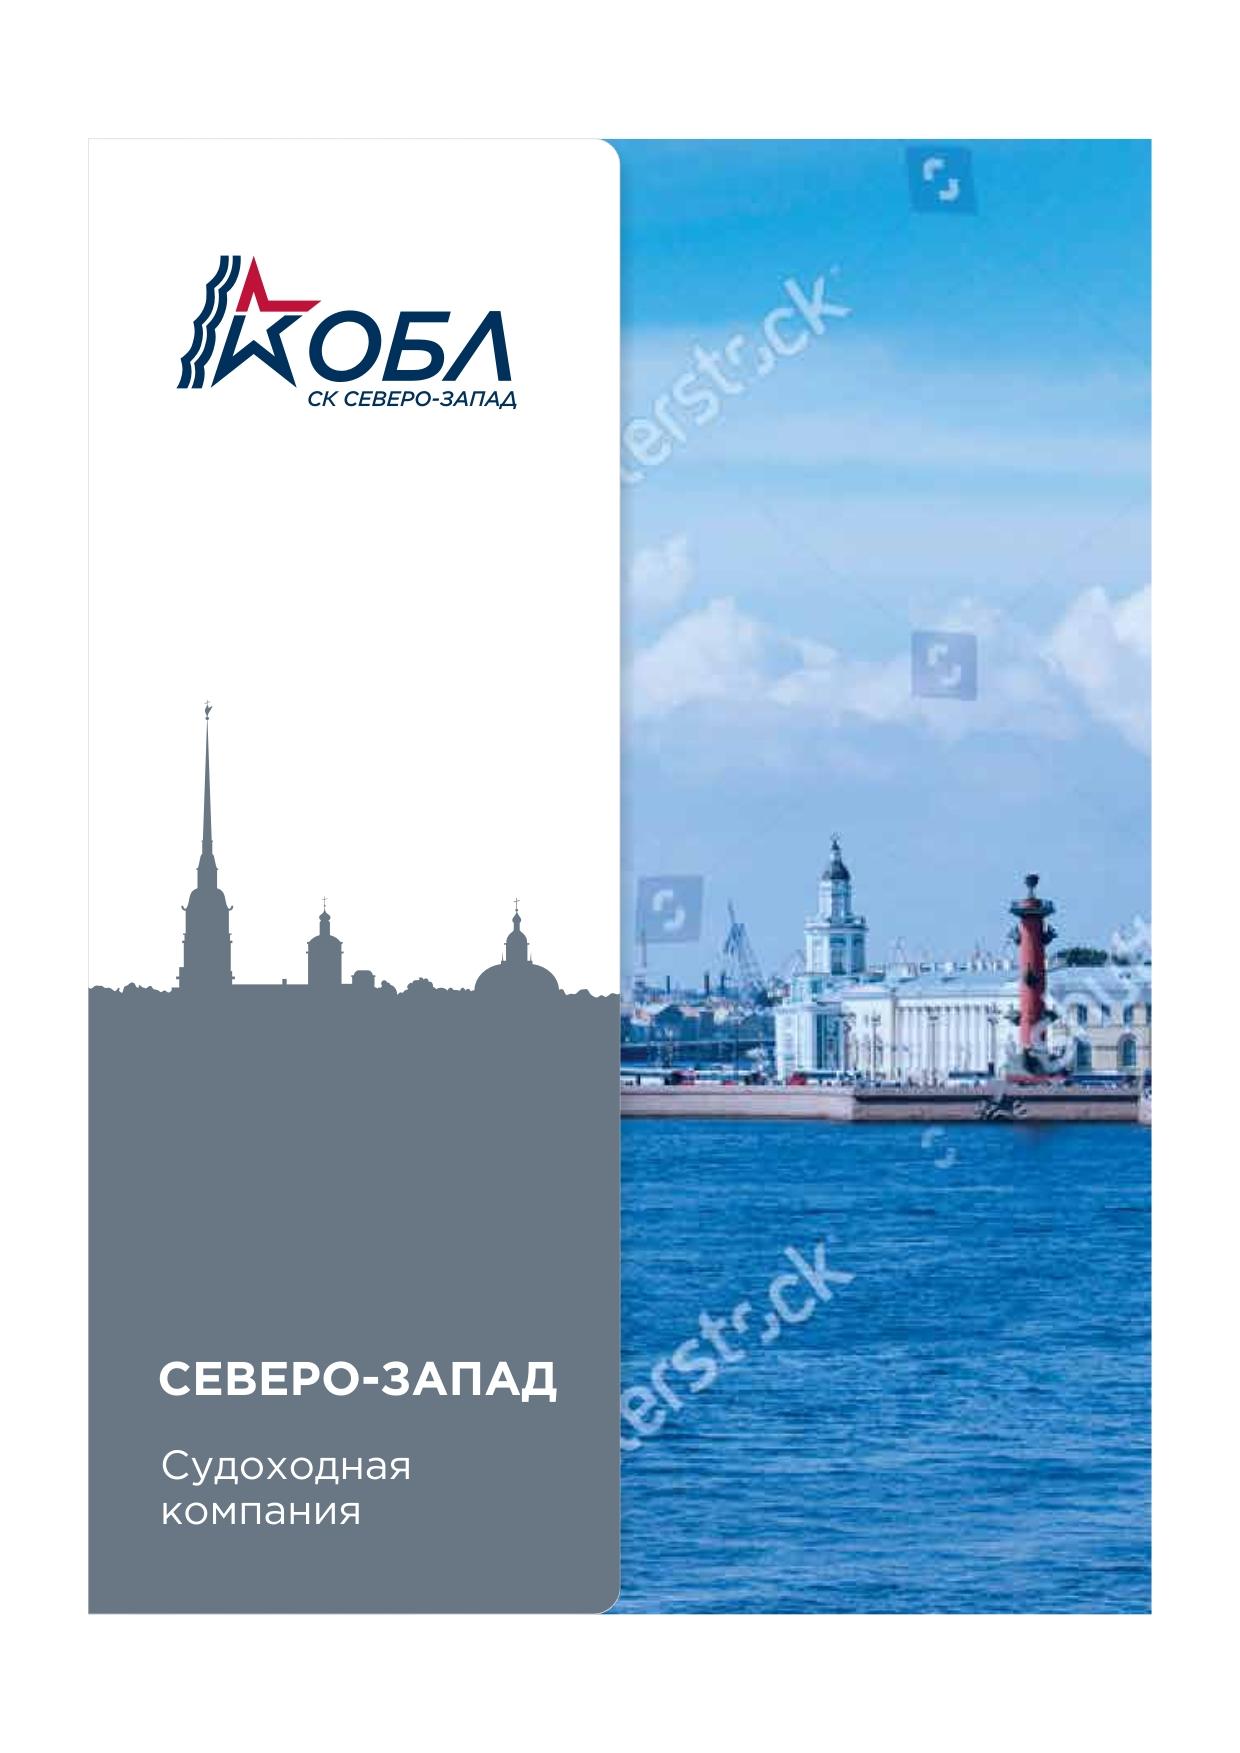 Дизайн и верстка лифлетов 3х дочерних судоходных компаний  фото f_9135b4284a541b0b.jpg